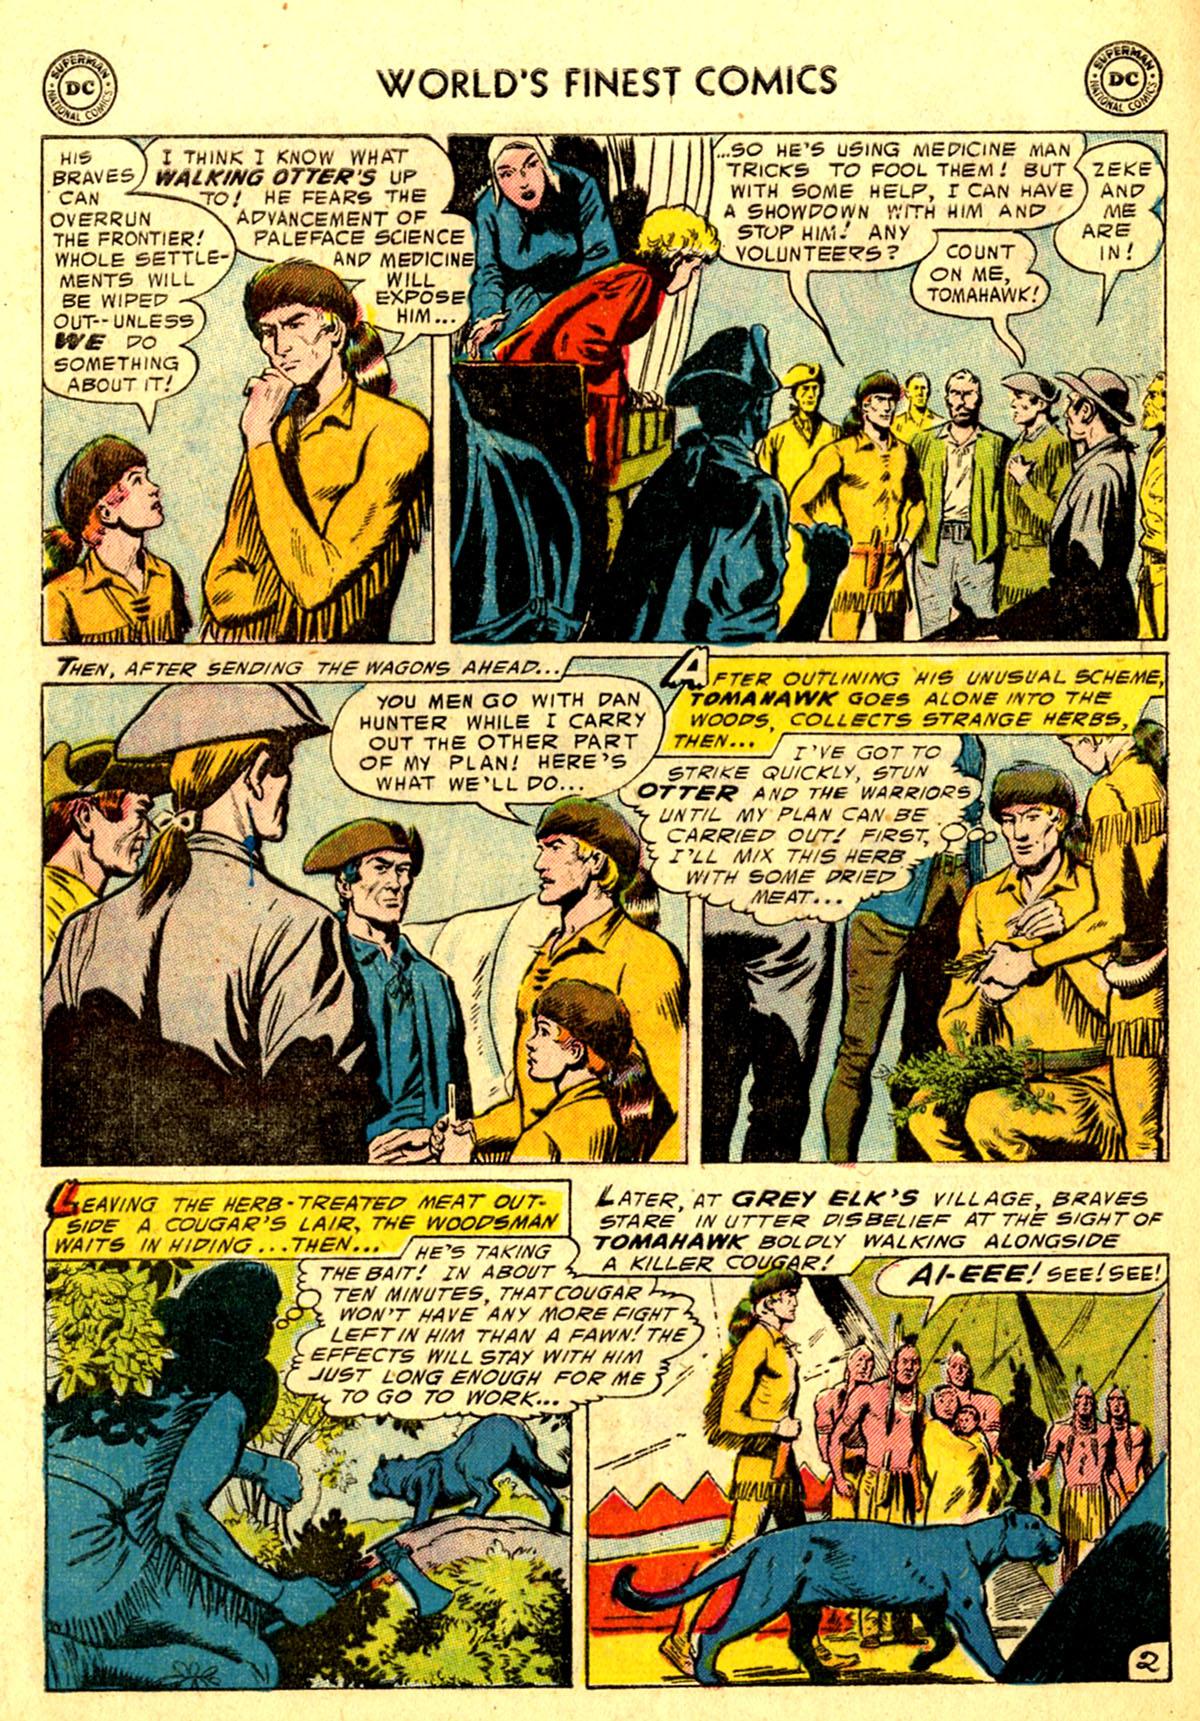 Read online World's Finest Comics comic -  Issue #75 - 28